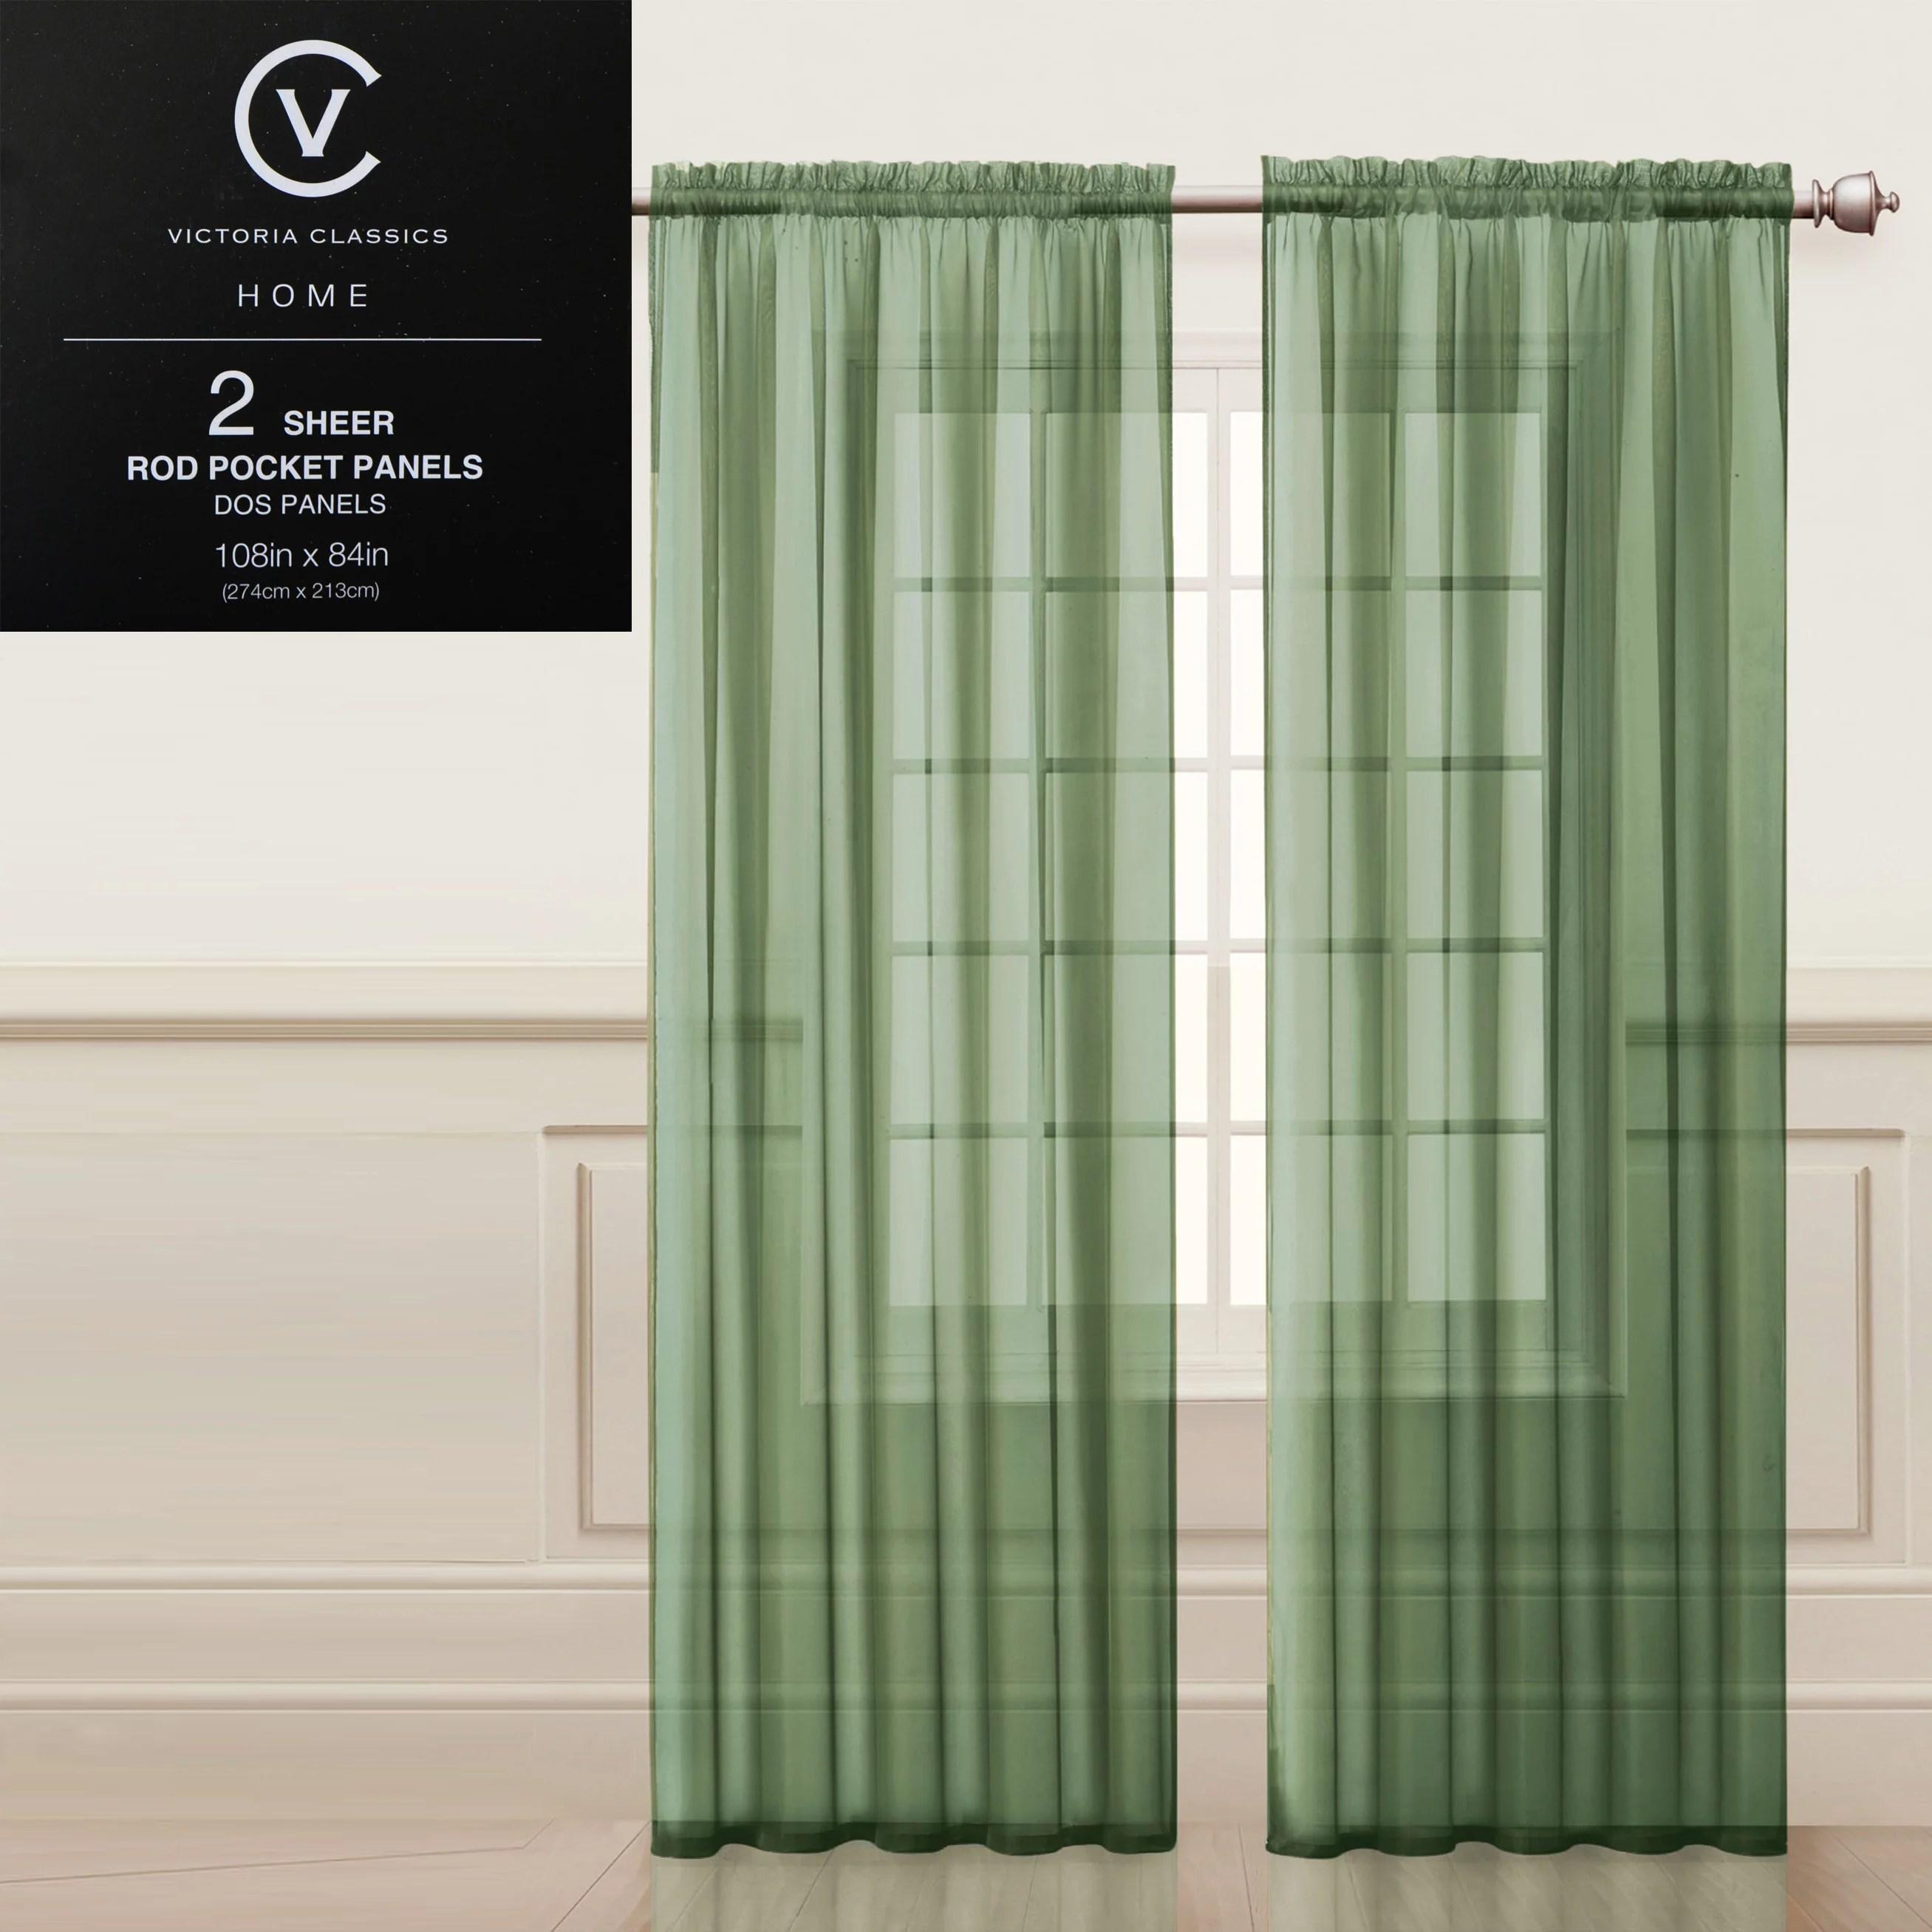 two 2 sage green sheer rod pocket window curtain panels 108 w x 84 l fully hemmed